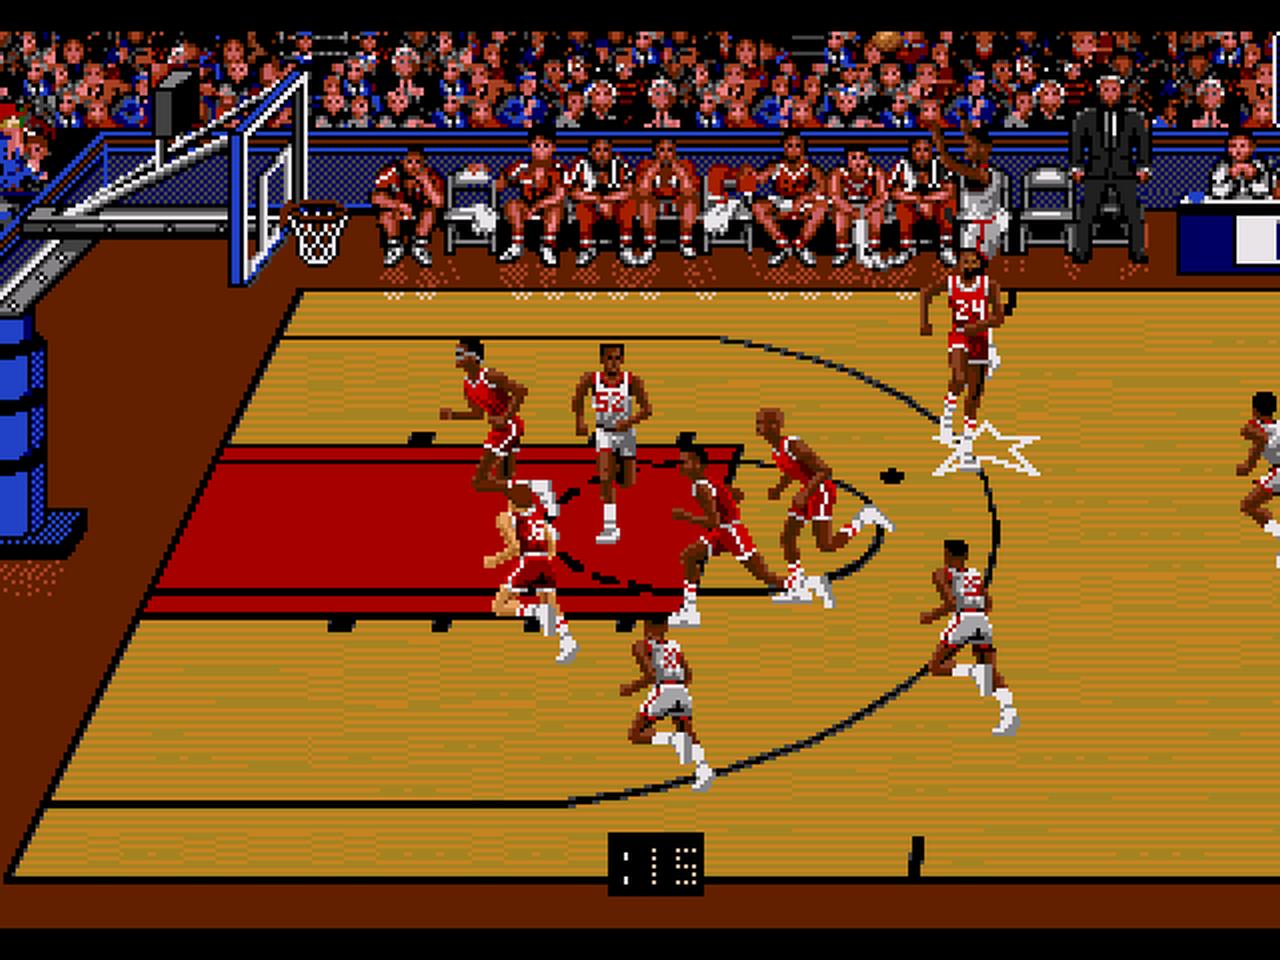 Bulls vs Blazers and the NBA Playoffs Screenshots ...